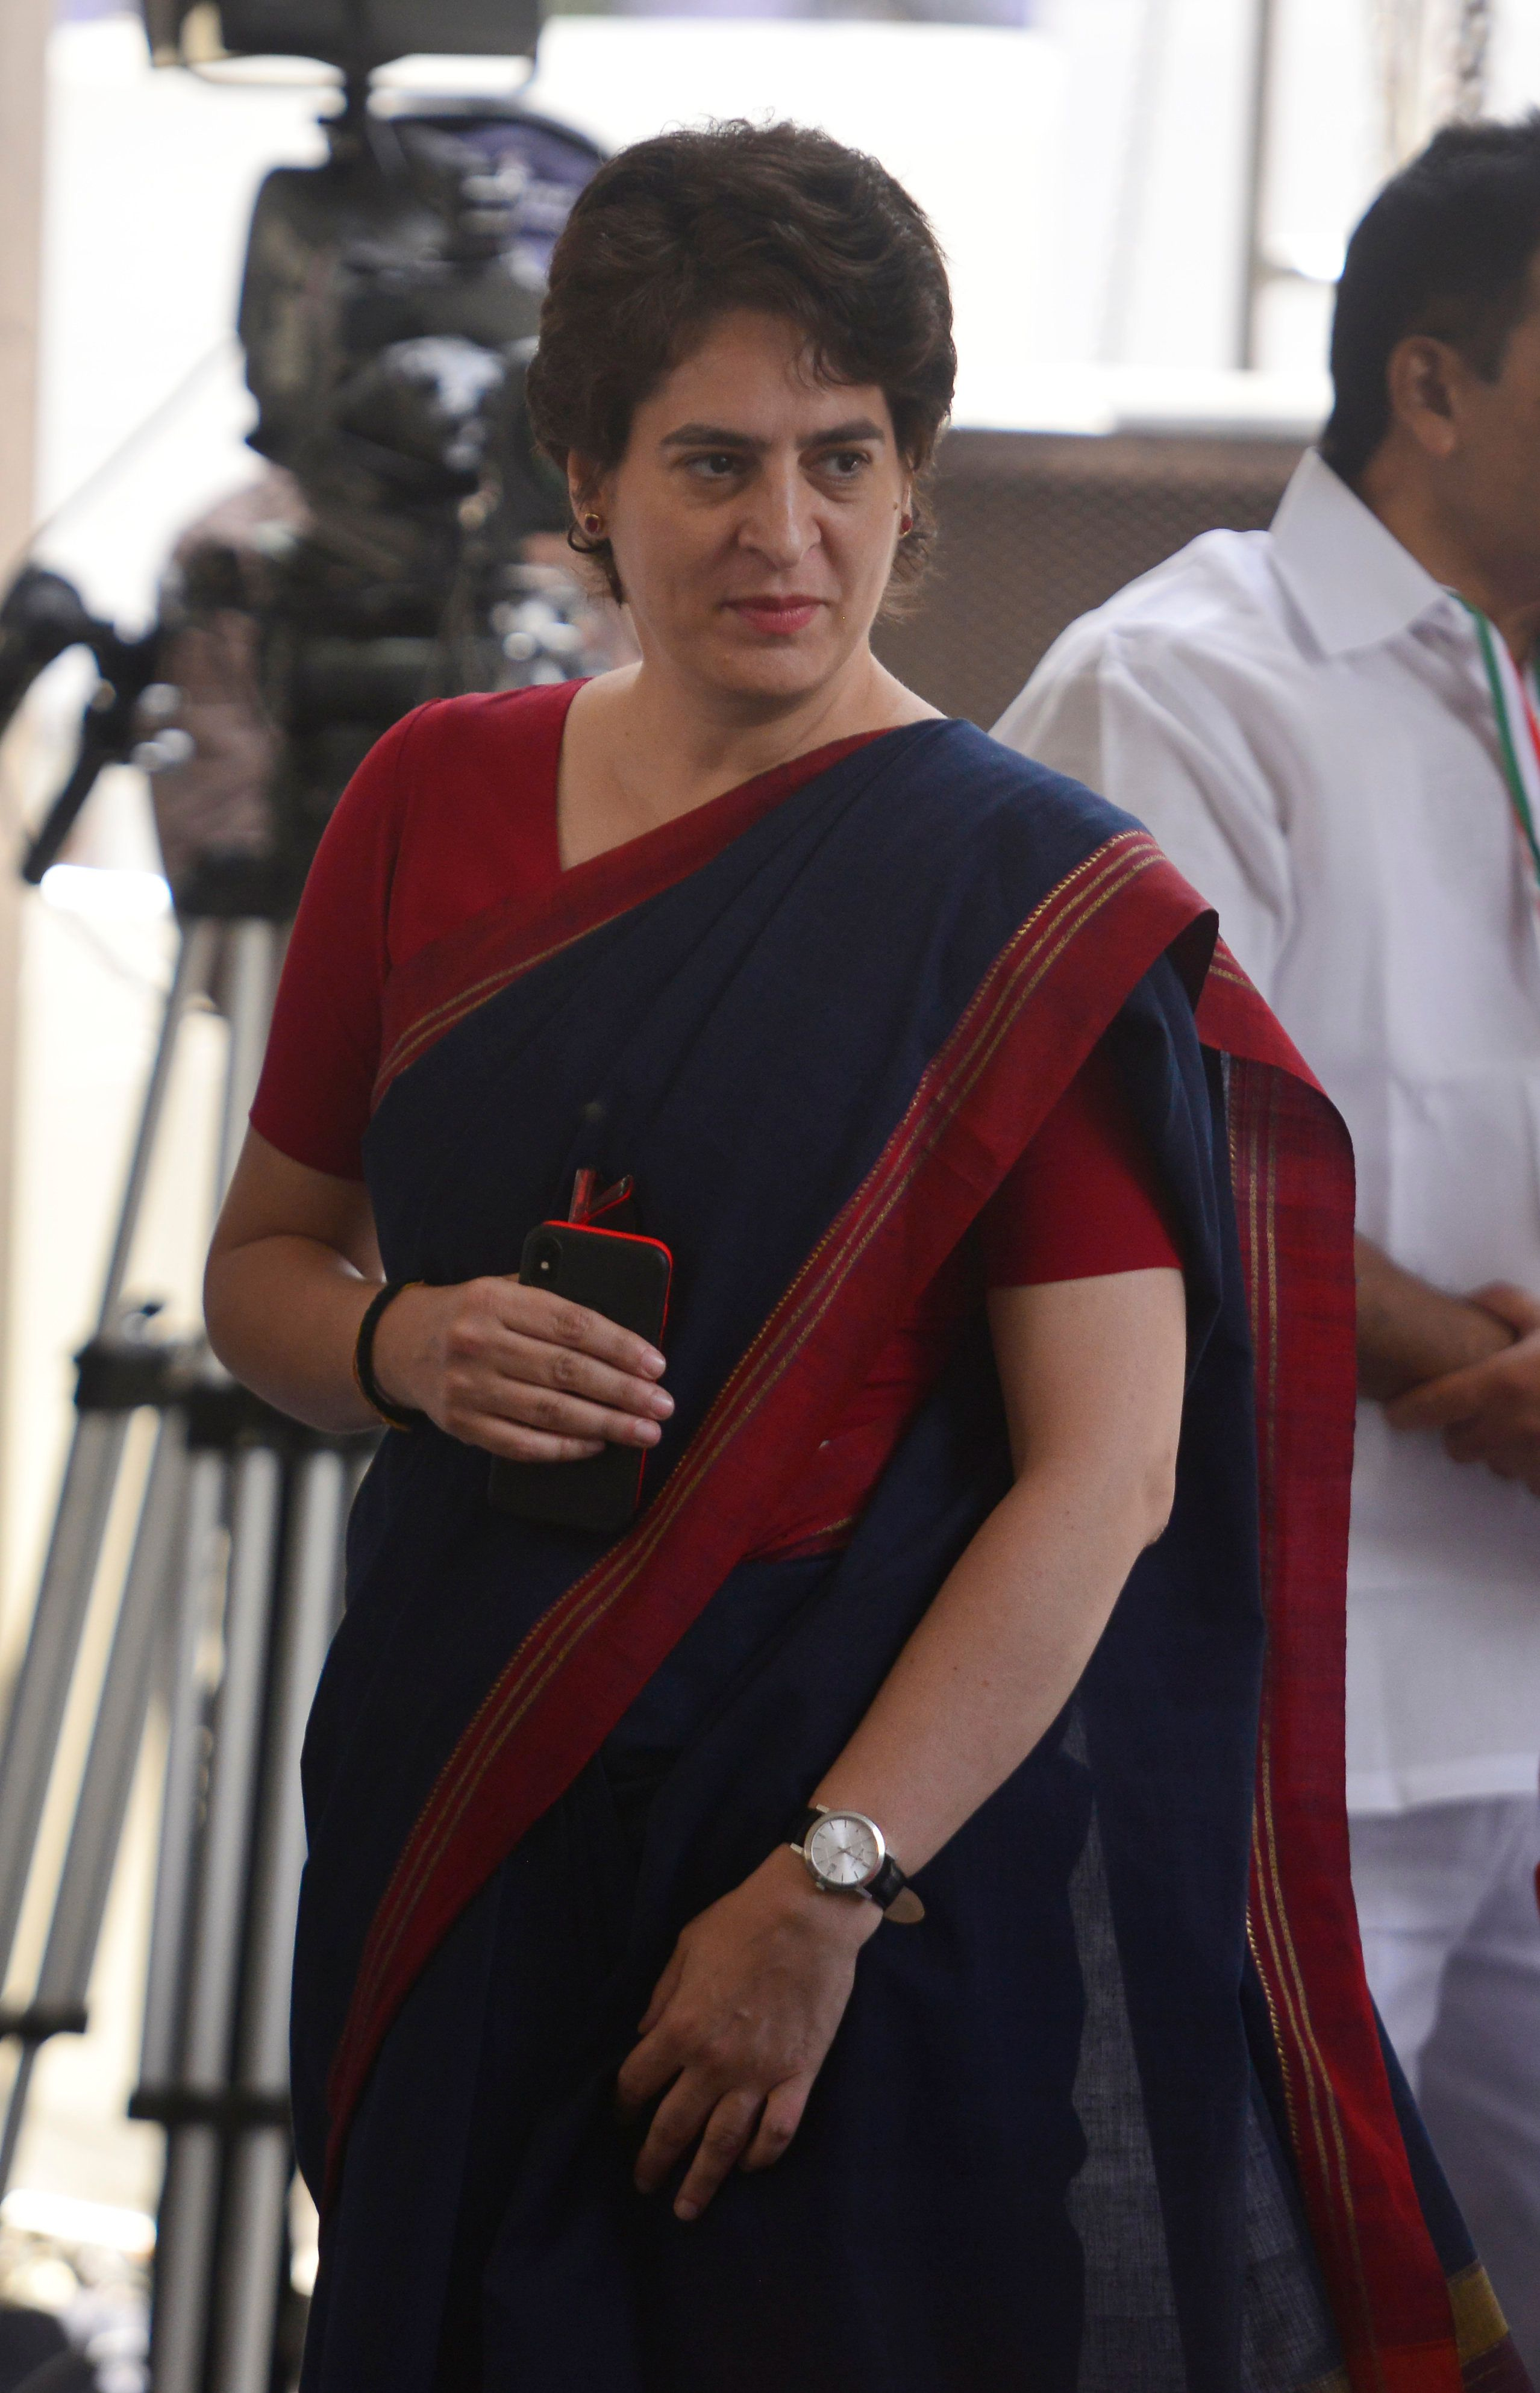 Priyanka Gandhi Accuses Smriti Irani Of Distributing Shoes To Insult Rahul